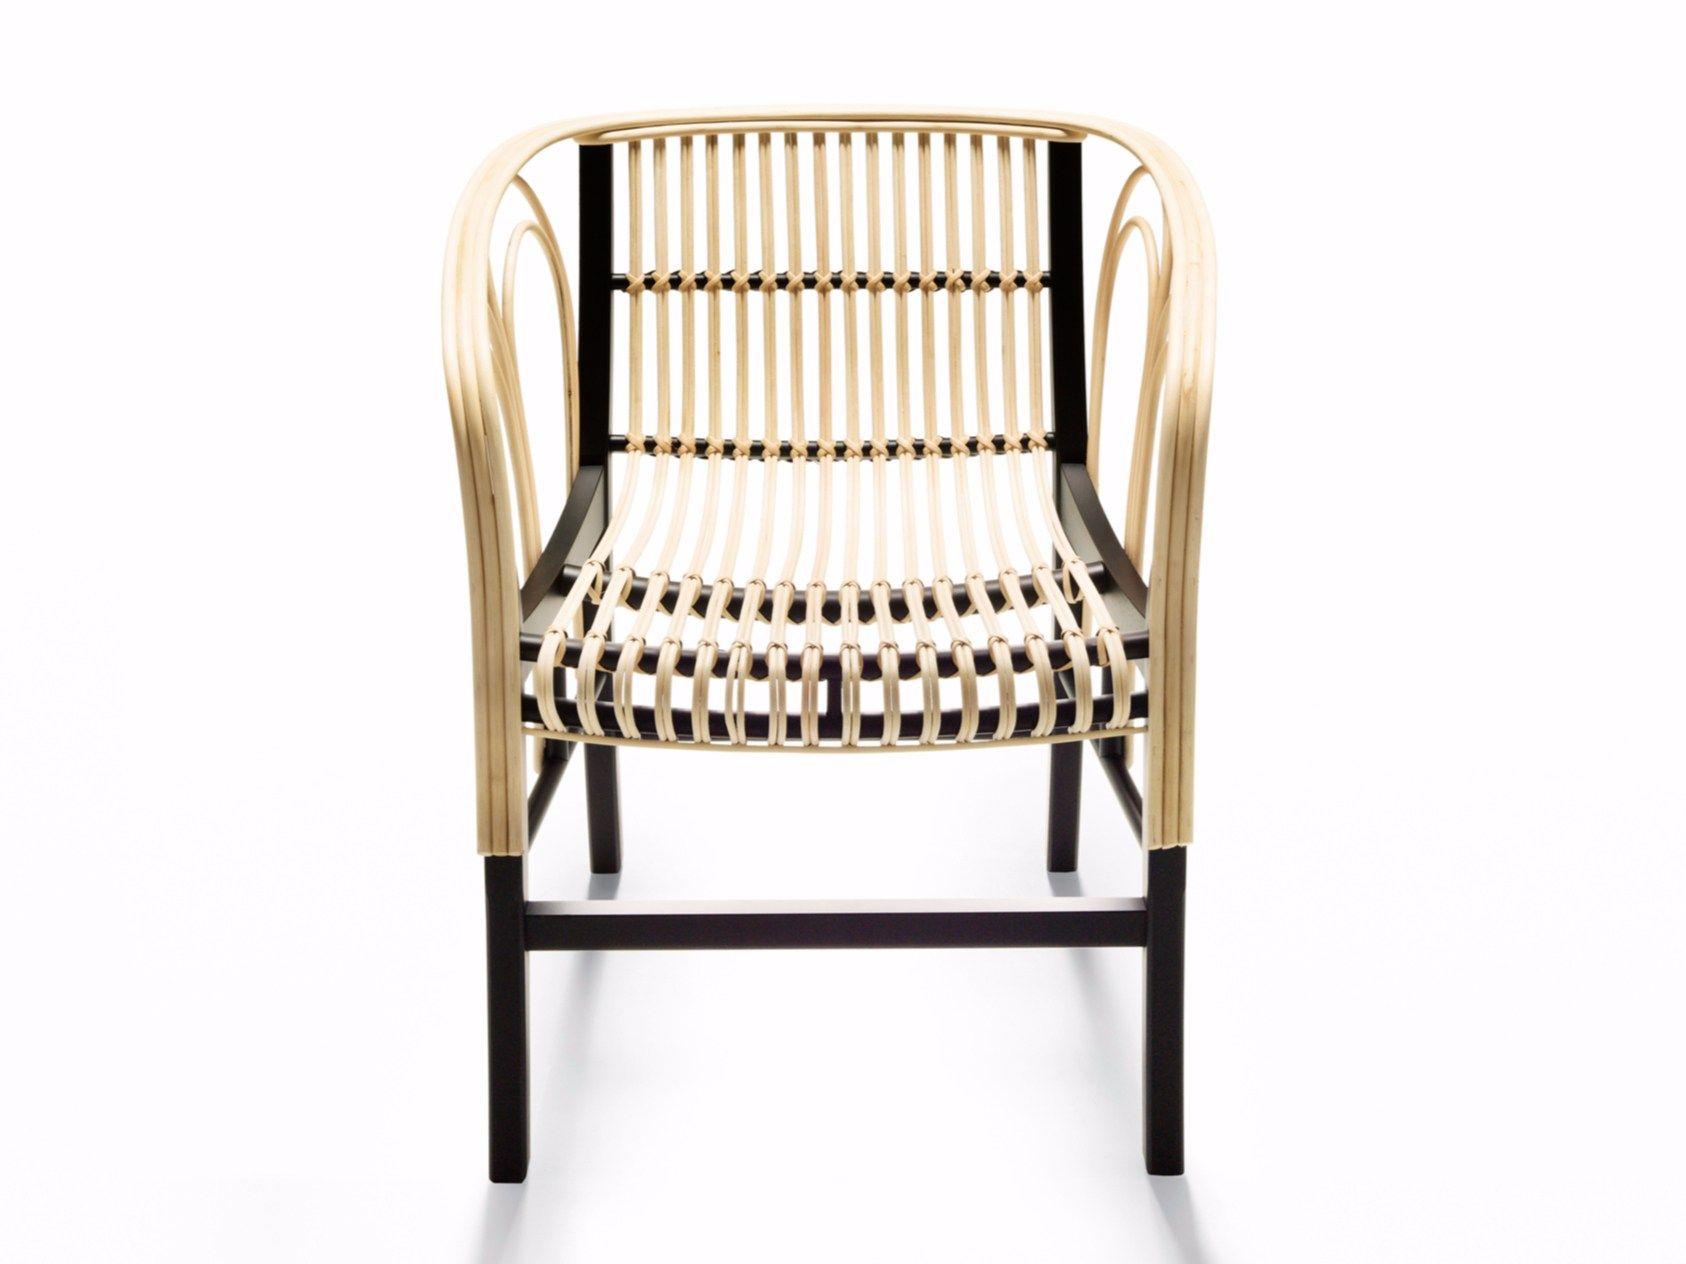 Sedie In Midollino.Sedia In Midollino Con Braccioli Uragano By De Padova Design